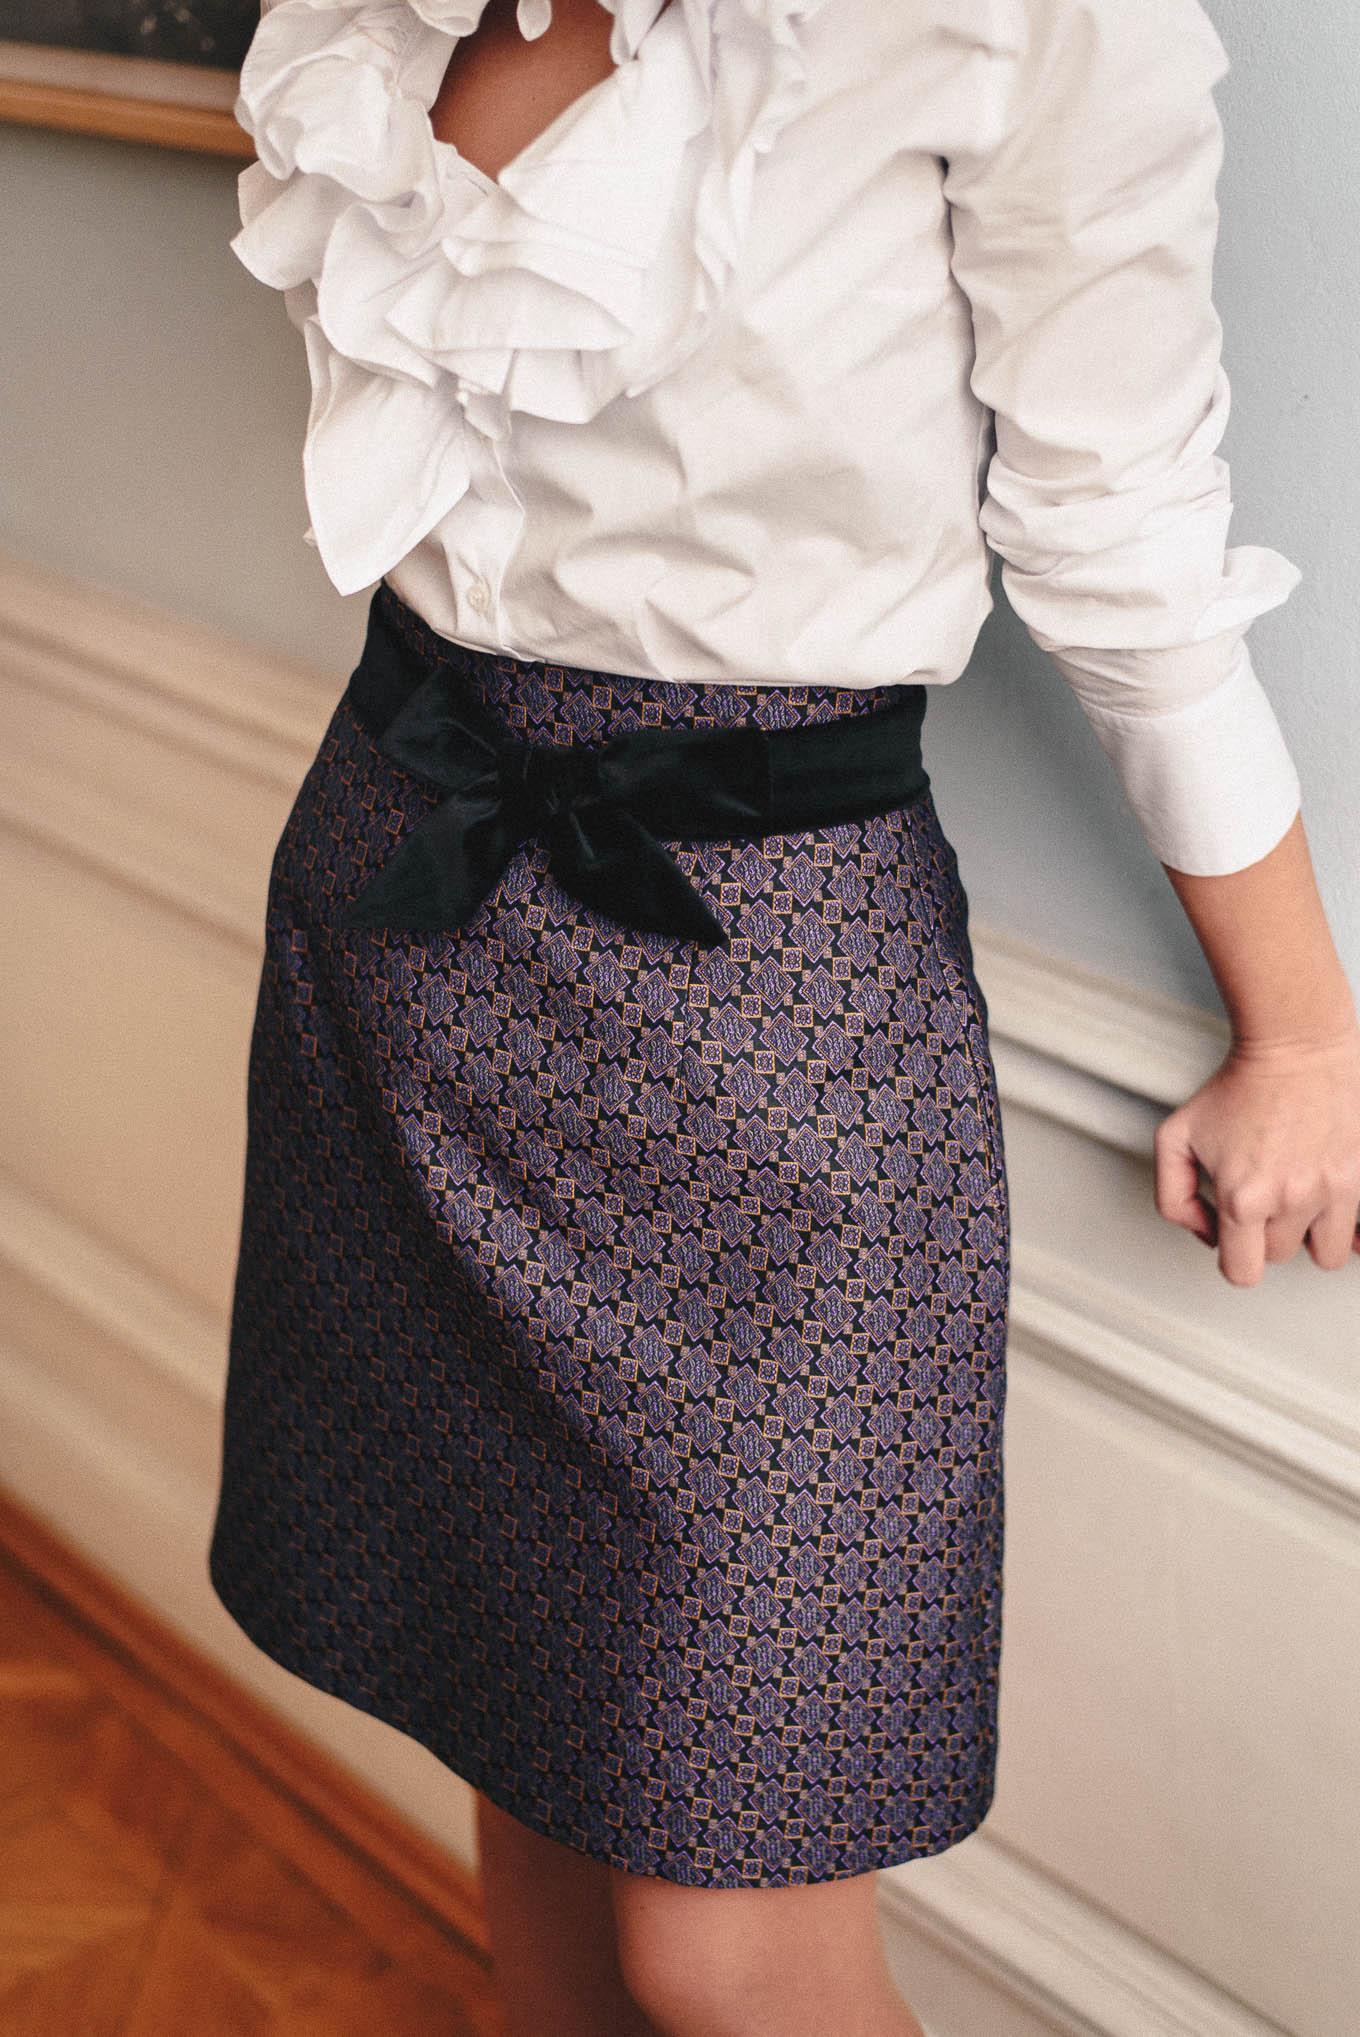 jacquard skirt from Denina Martin Collection